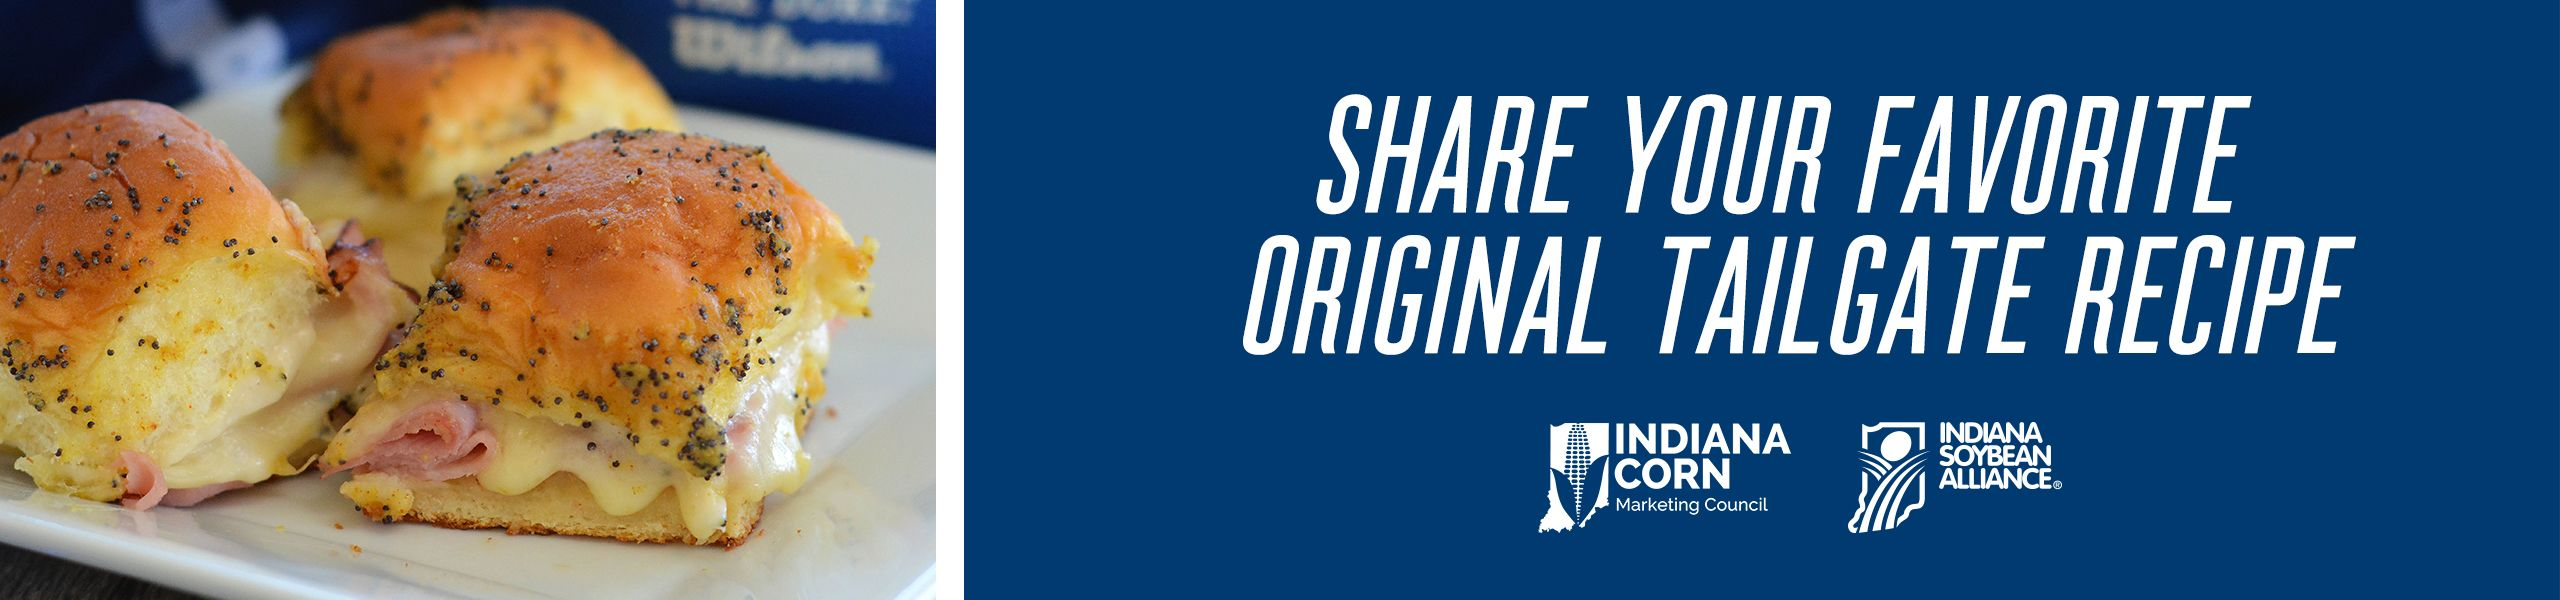 Share your favorite original tailgate recipe. Indiana Corn Marketing Council, Indiana Soybean Alliance